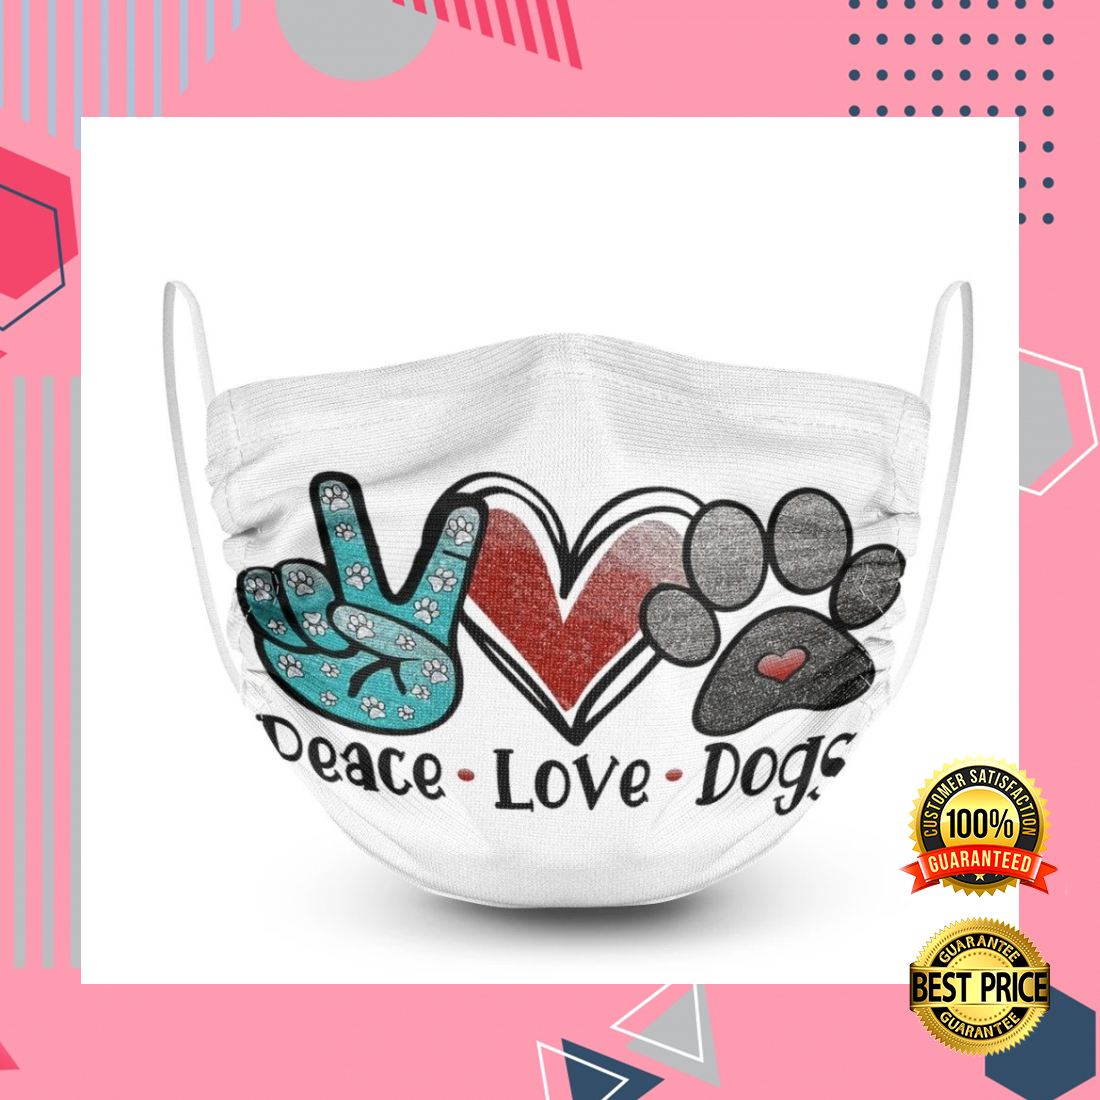 [Nice] Peace Love Dogs Face Mask